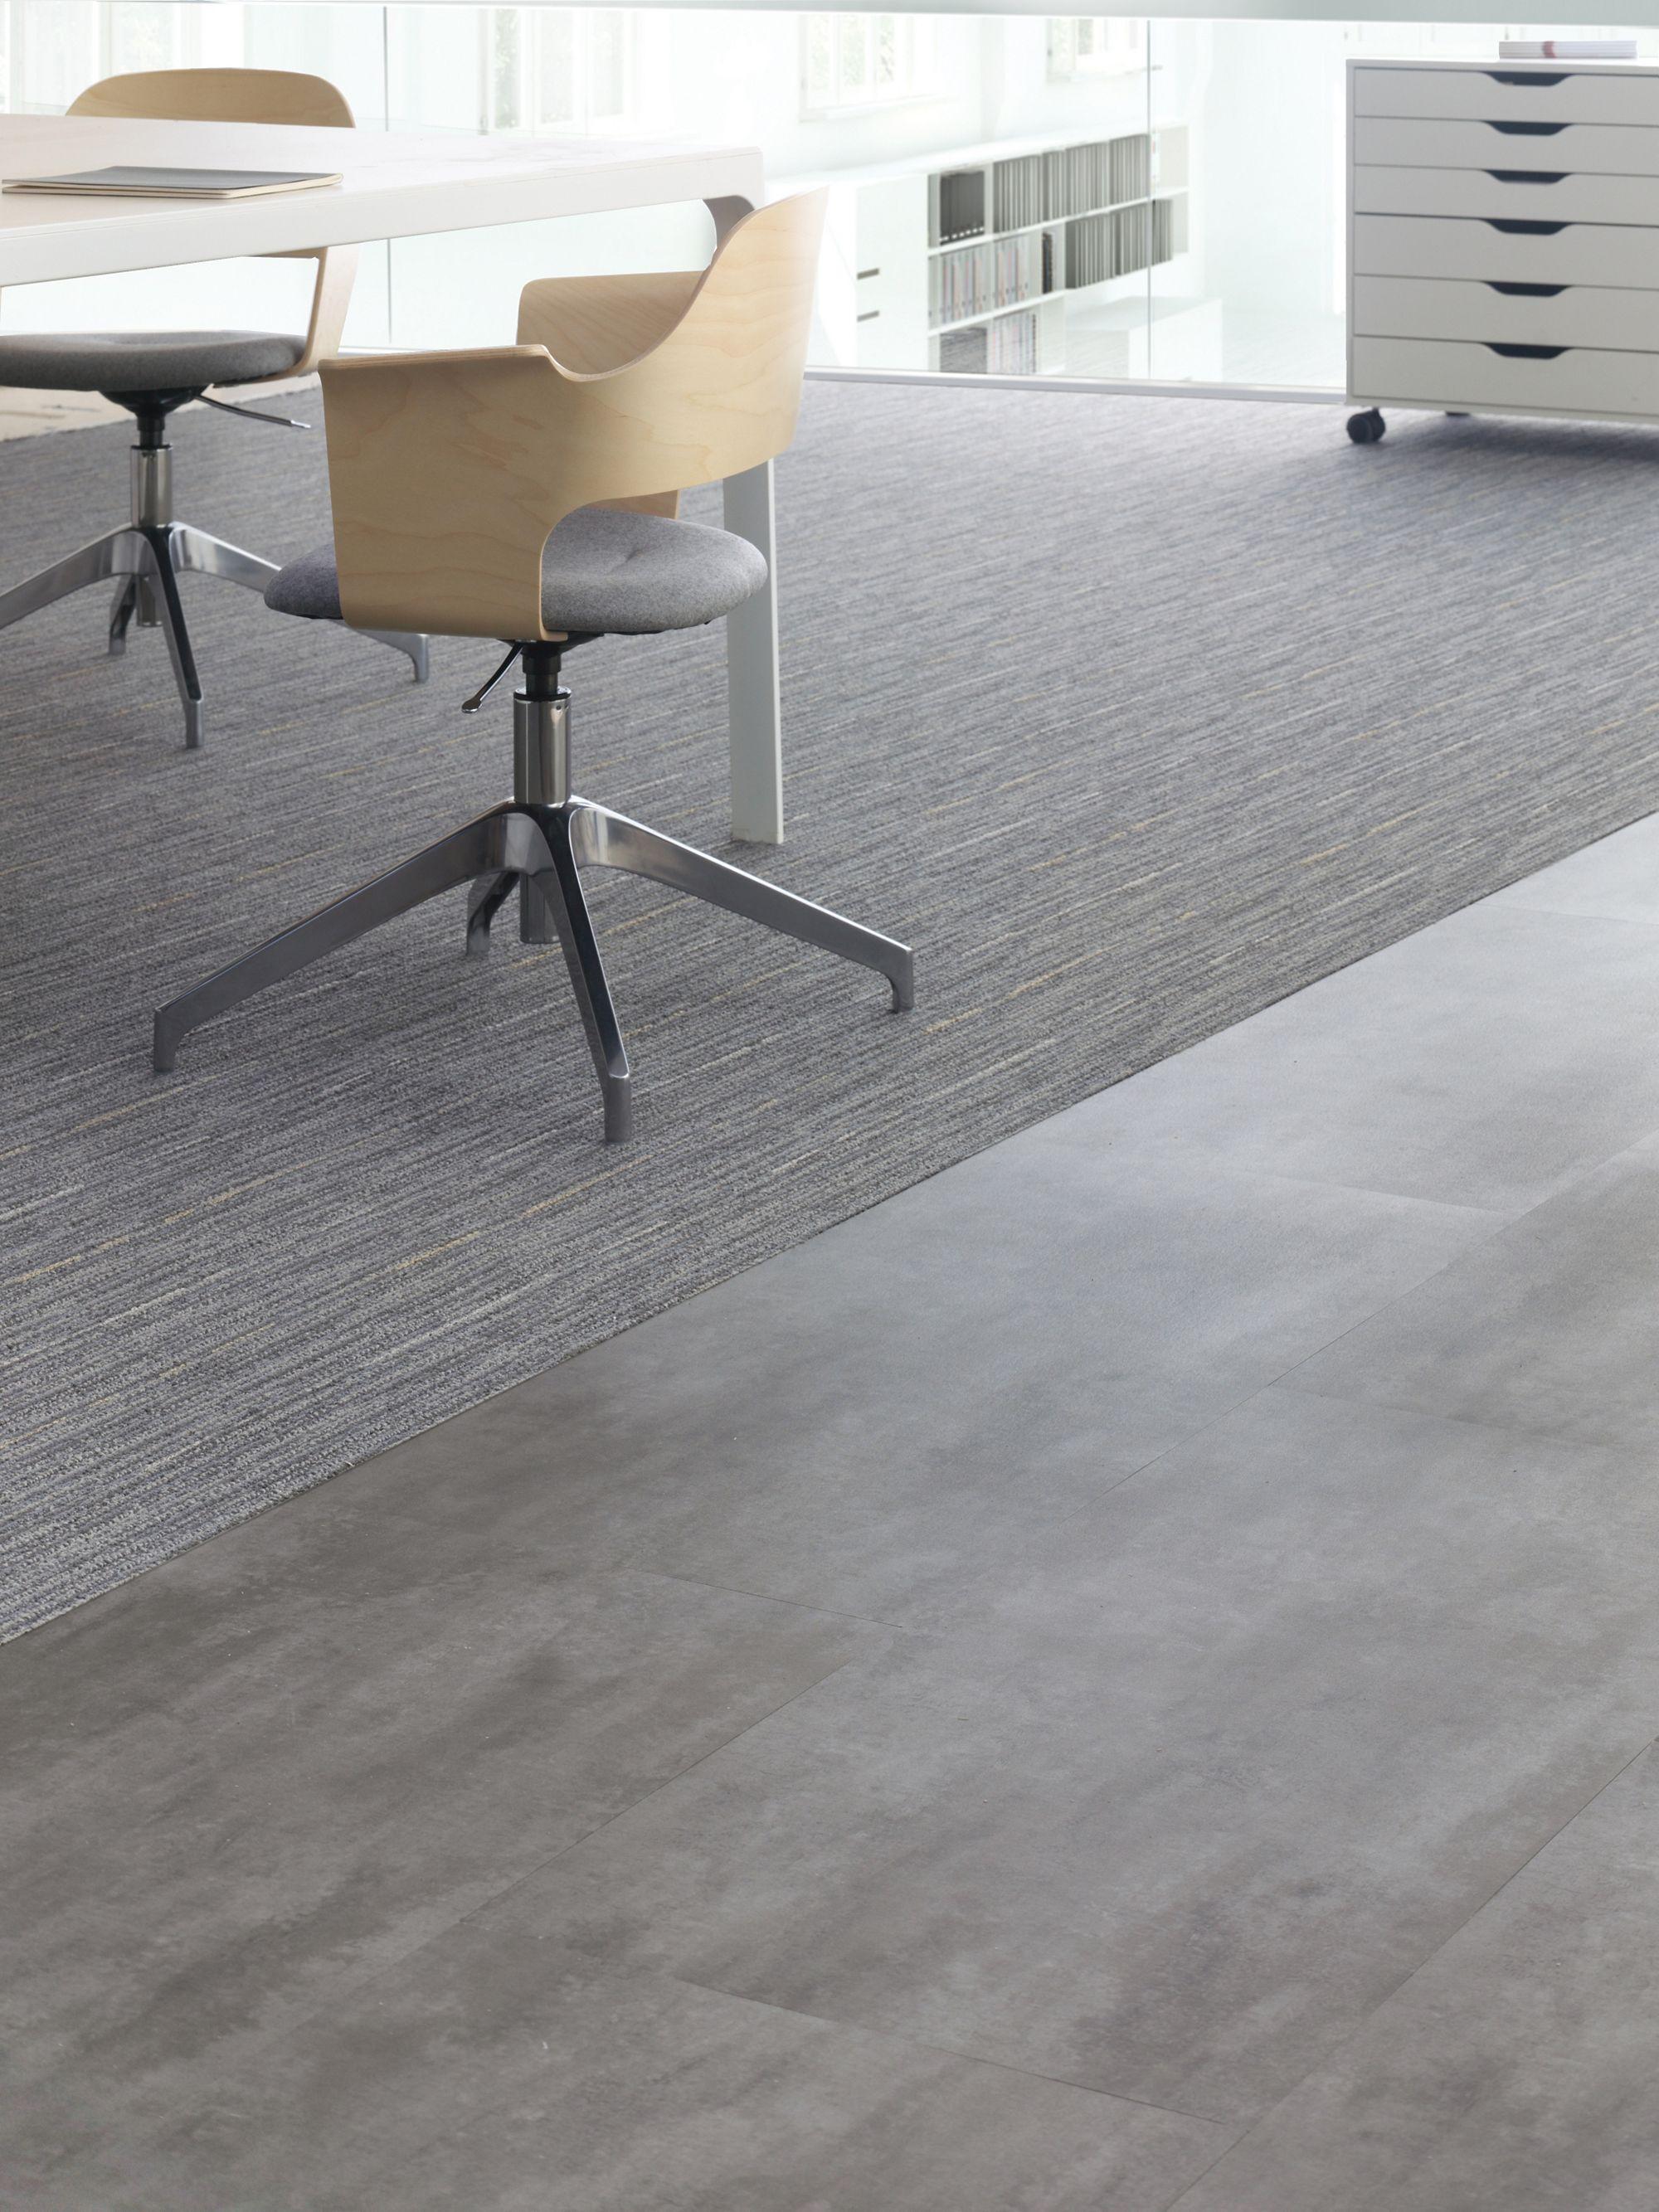 Broadloom Carpet Wired Mesh Patinaed Brass Mohawk Group